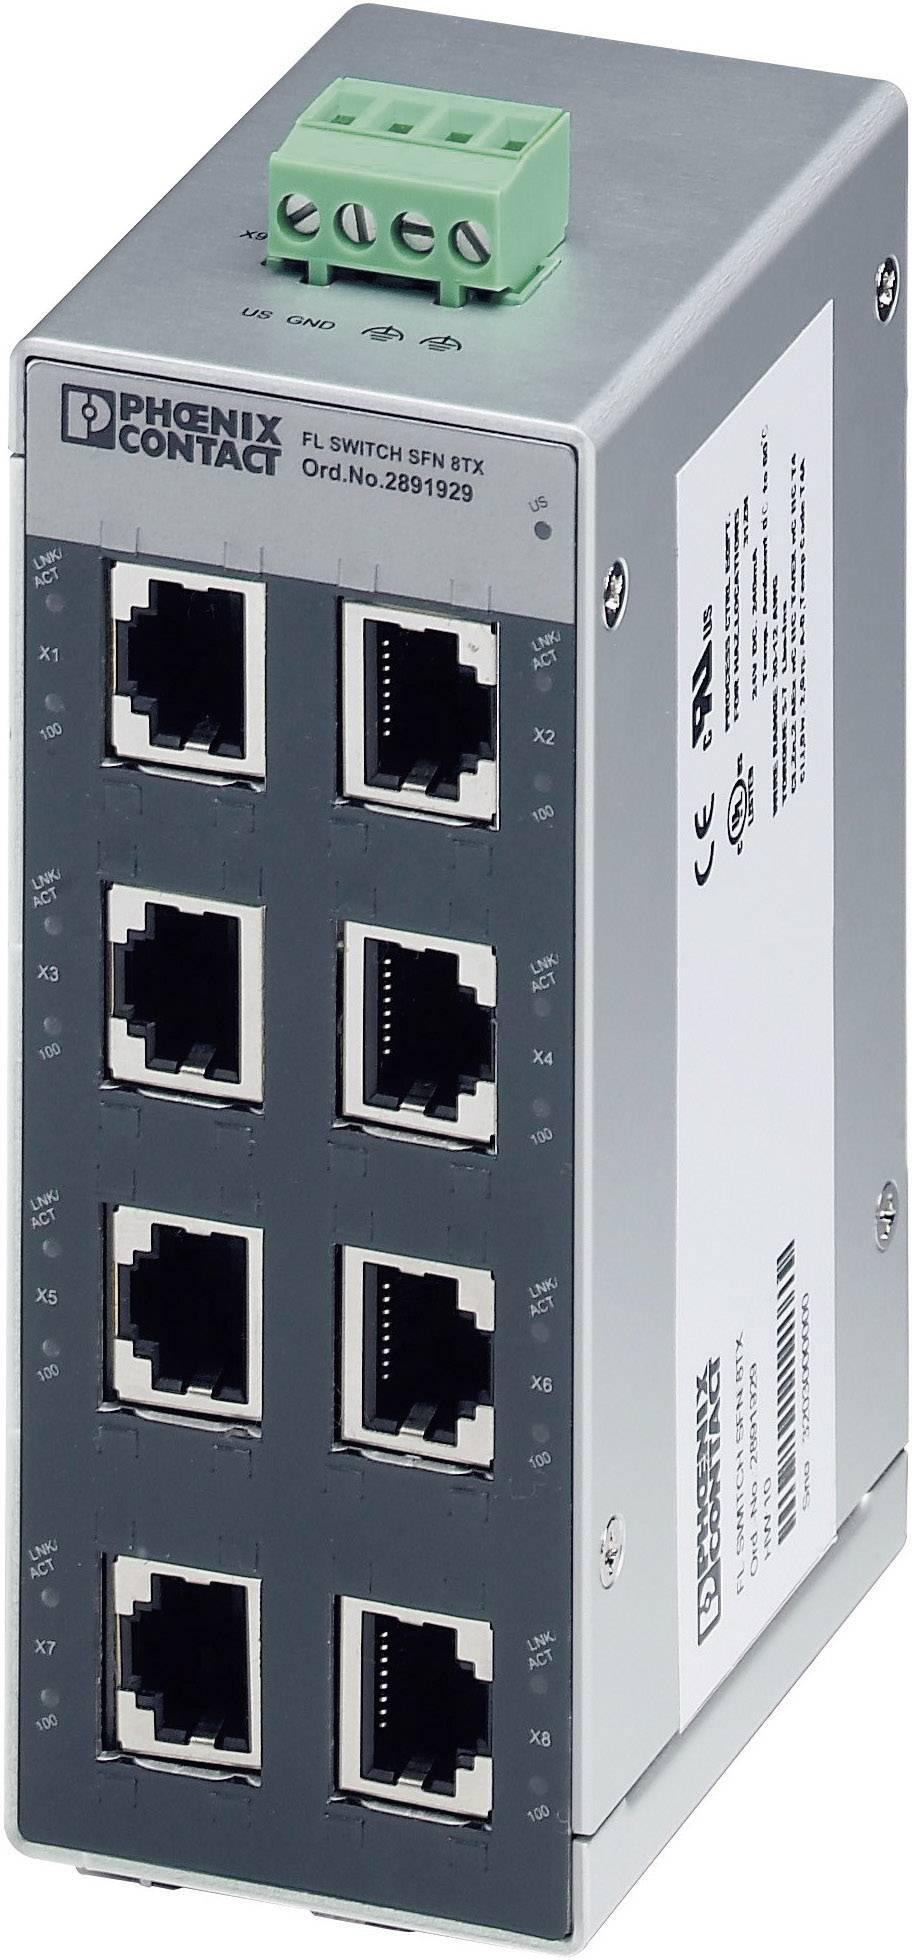 Ethernetový switch Phoenix Contact FL SWITCH SFN 8TX (2891929), 140 mA